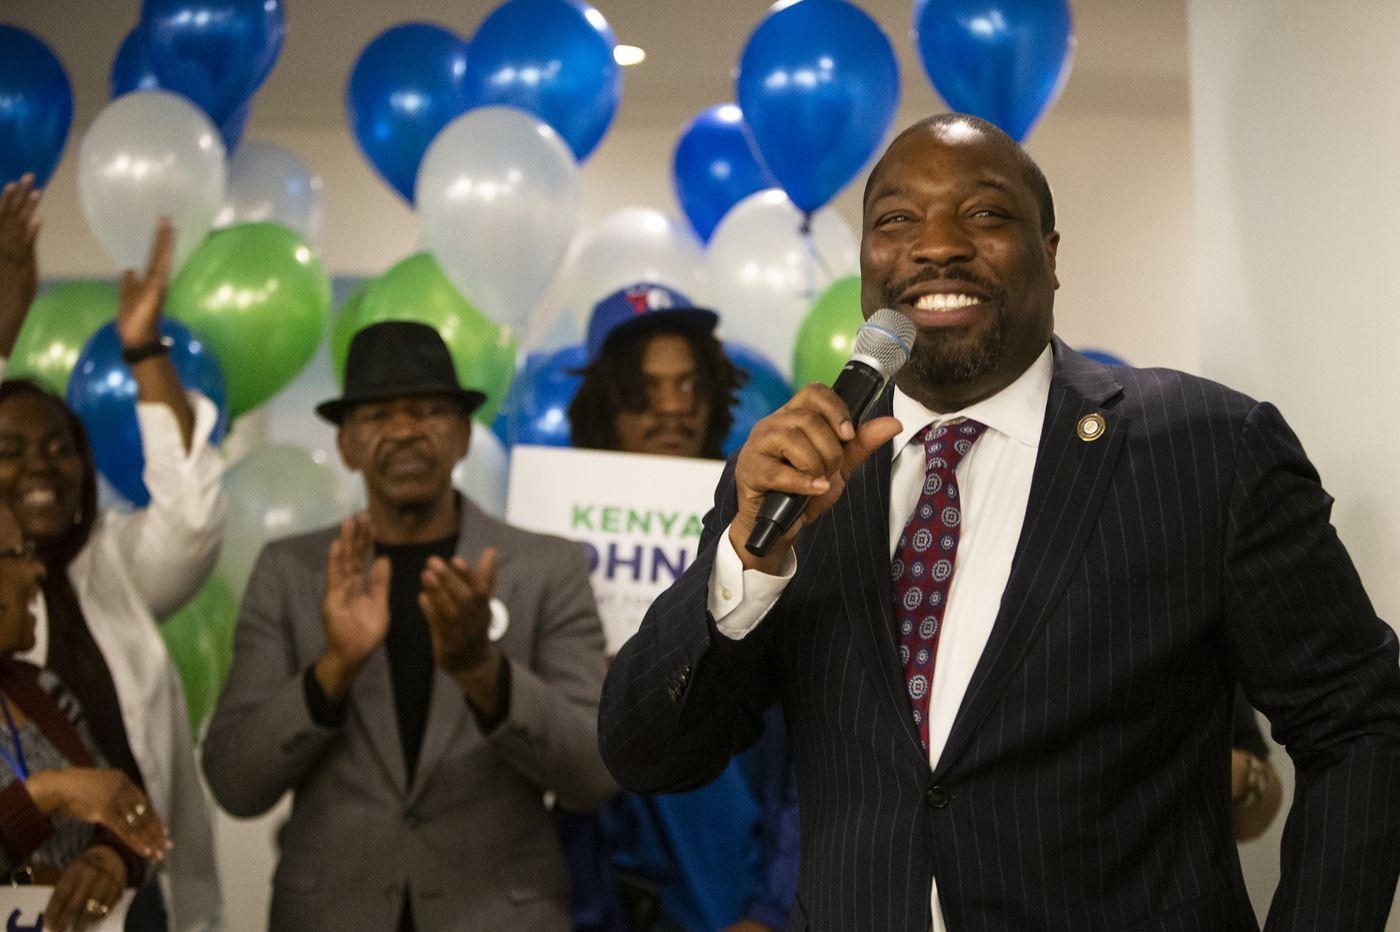 In a changing district, Councilman Kenyatta Johnson easily wins Democratic nomination